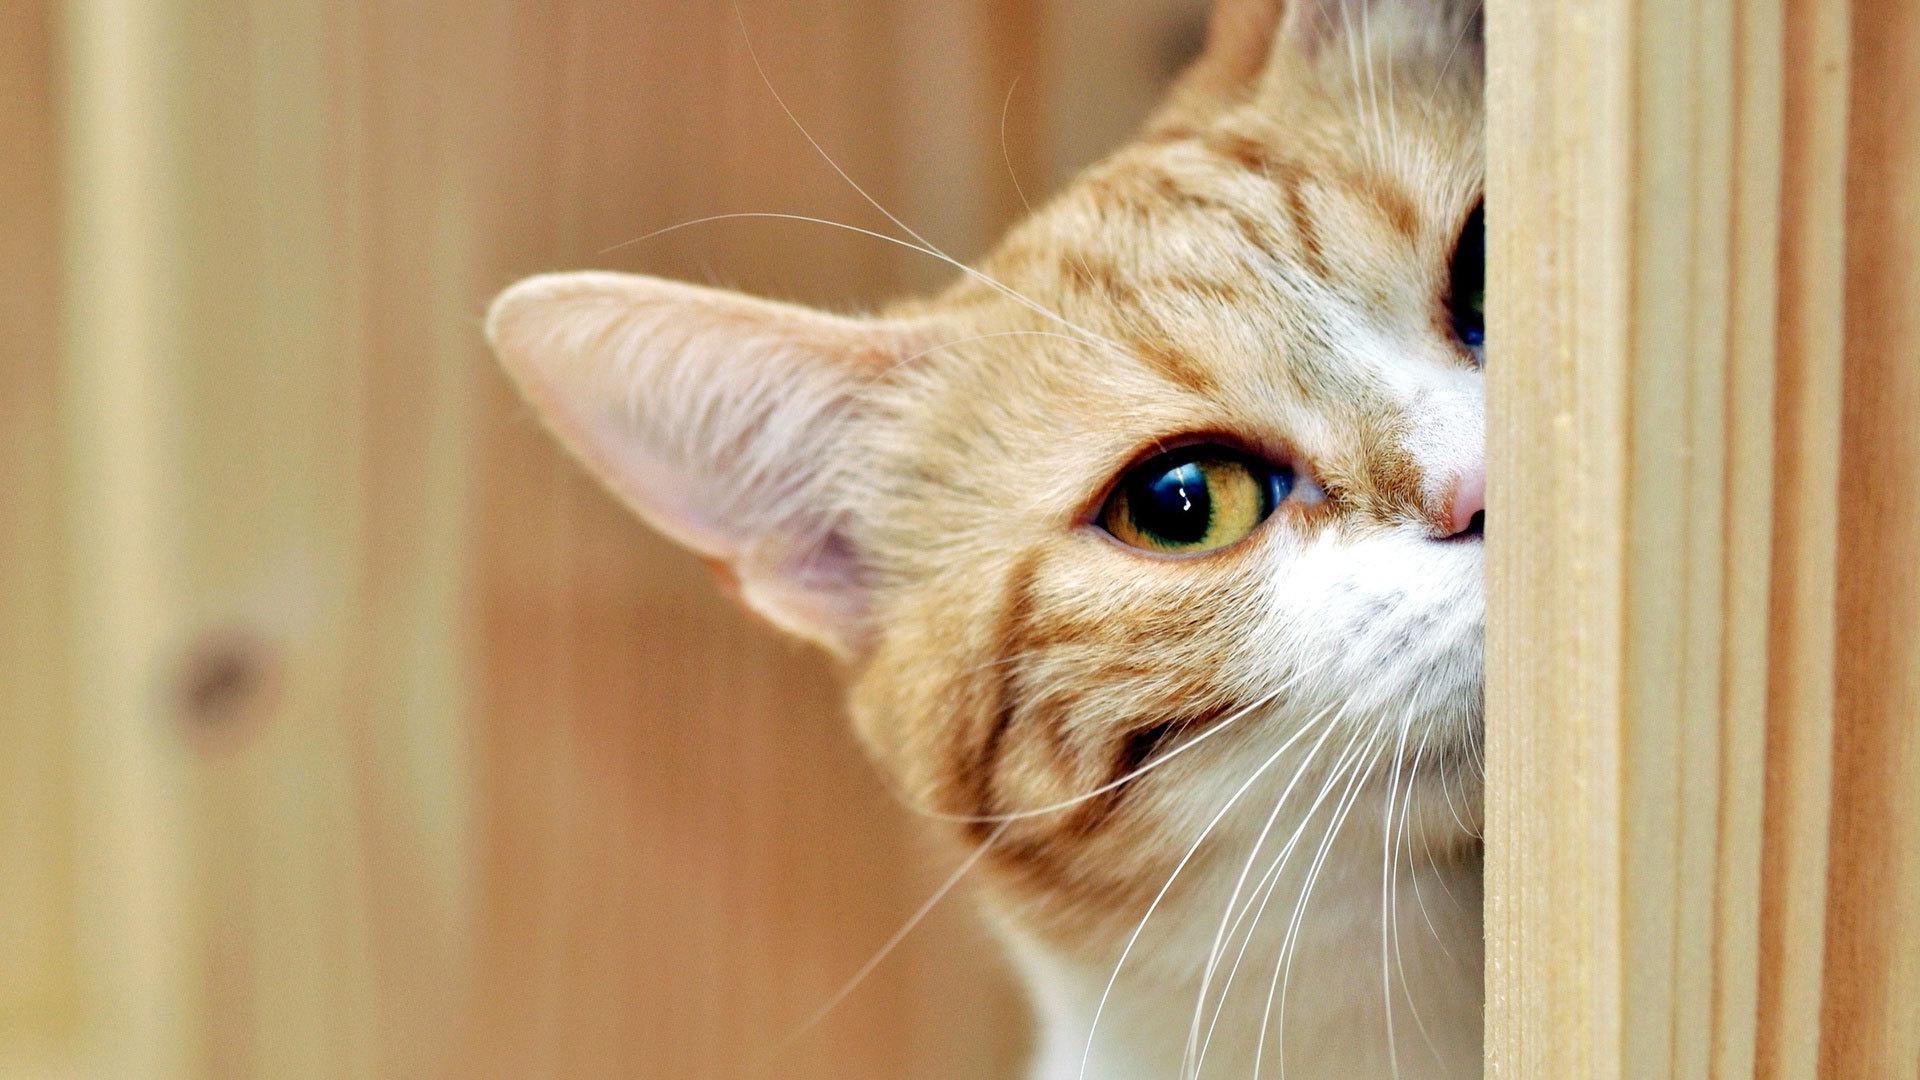 http://cdn.fishki.net/upload/post/201411/06/1324910/animals___cats_red_cat_peeping_044419_.jpg